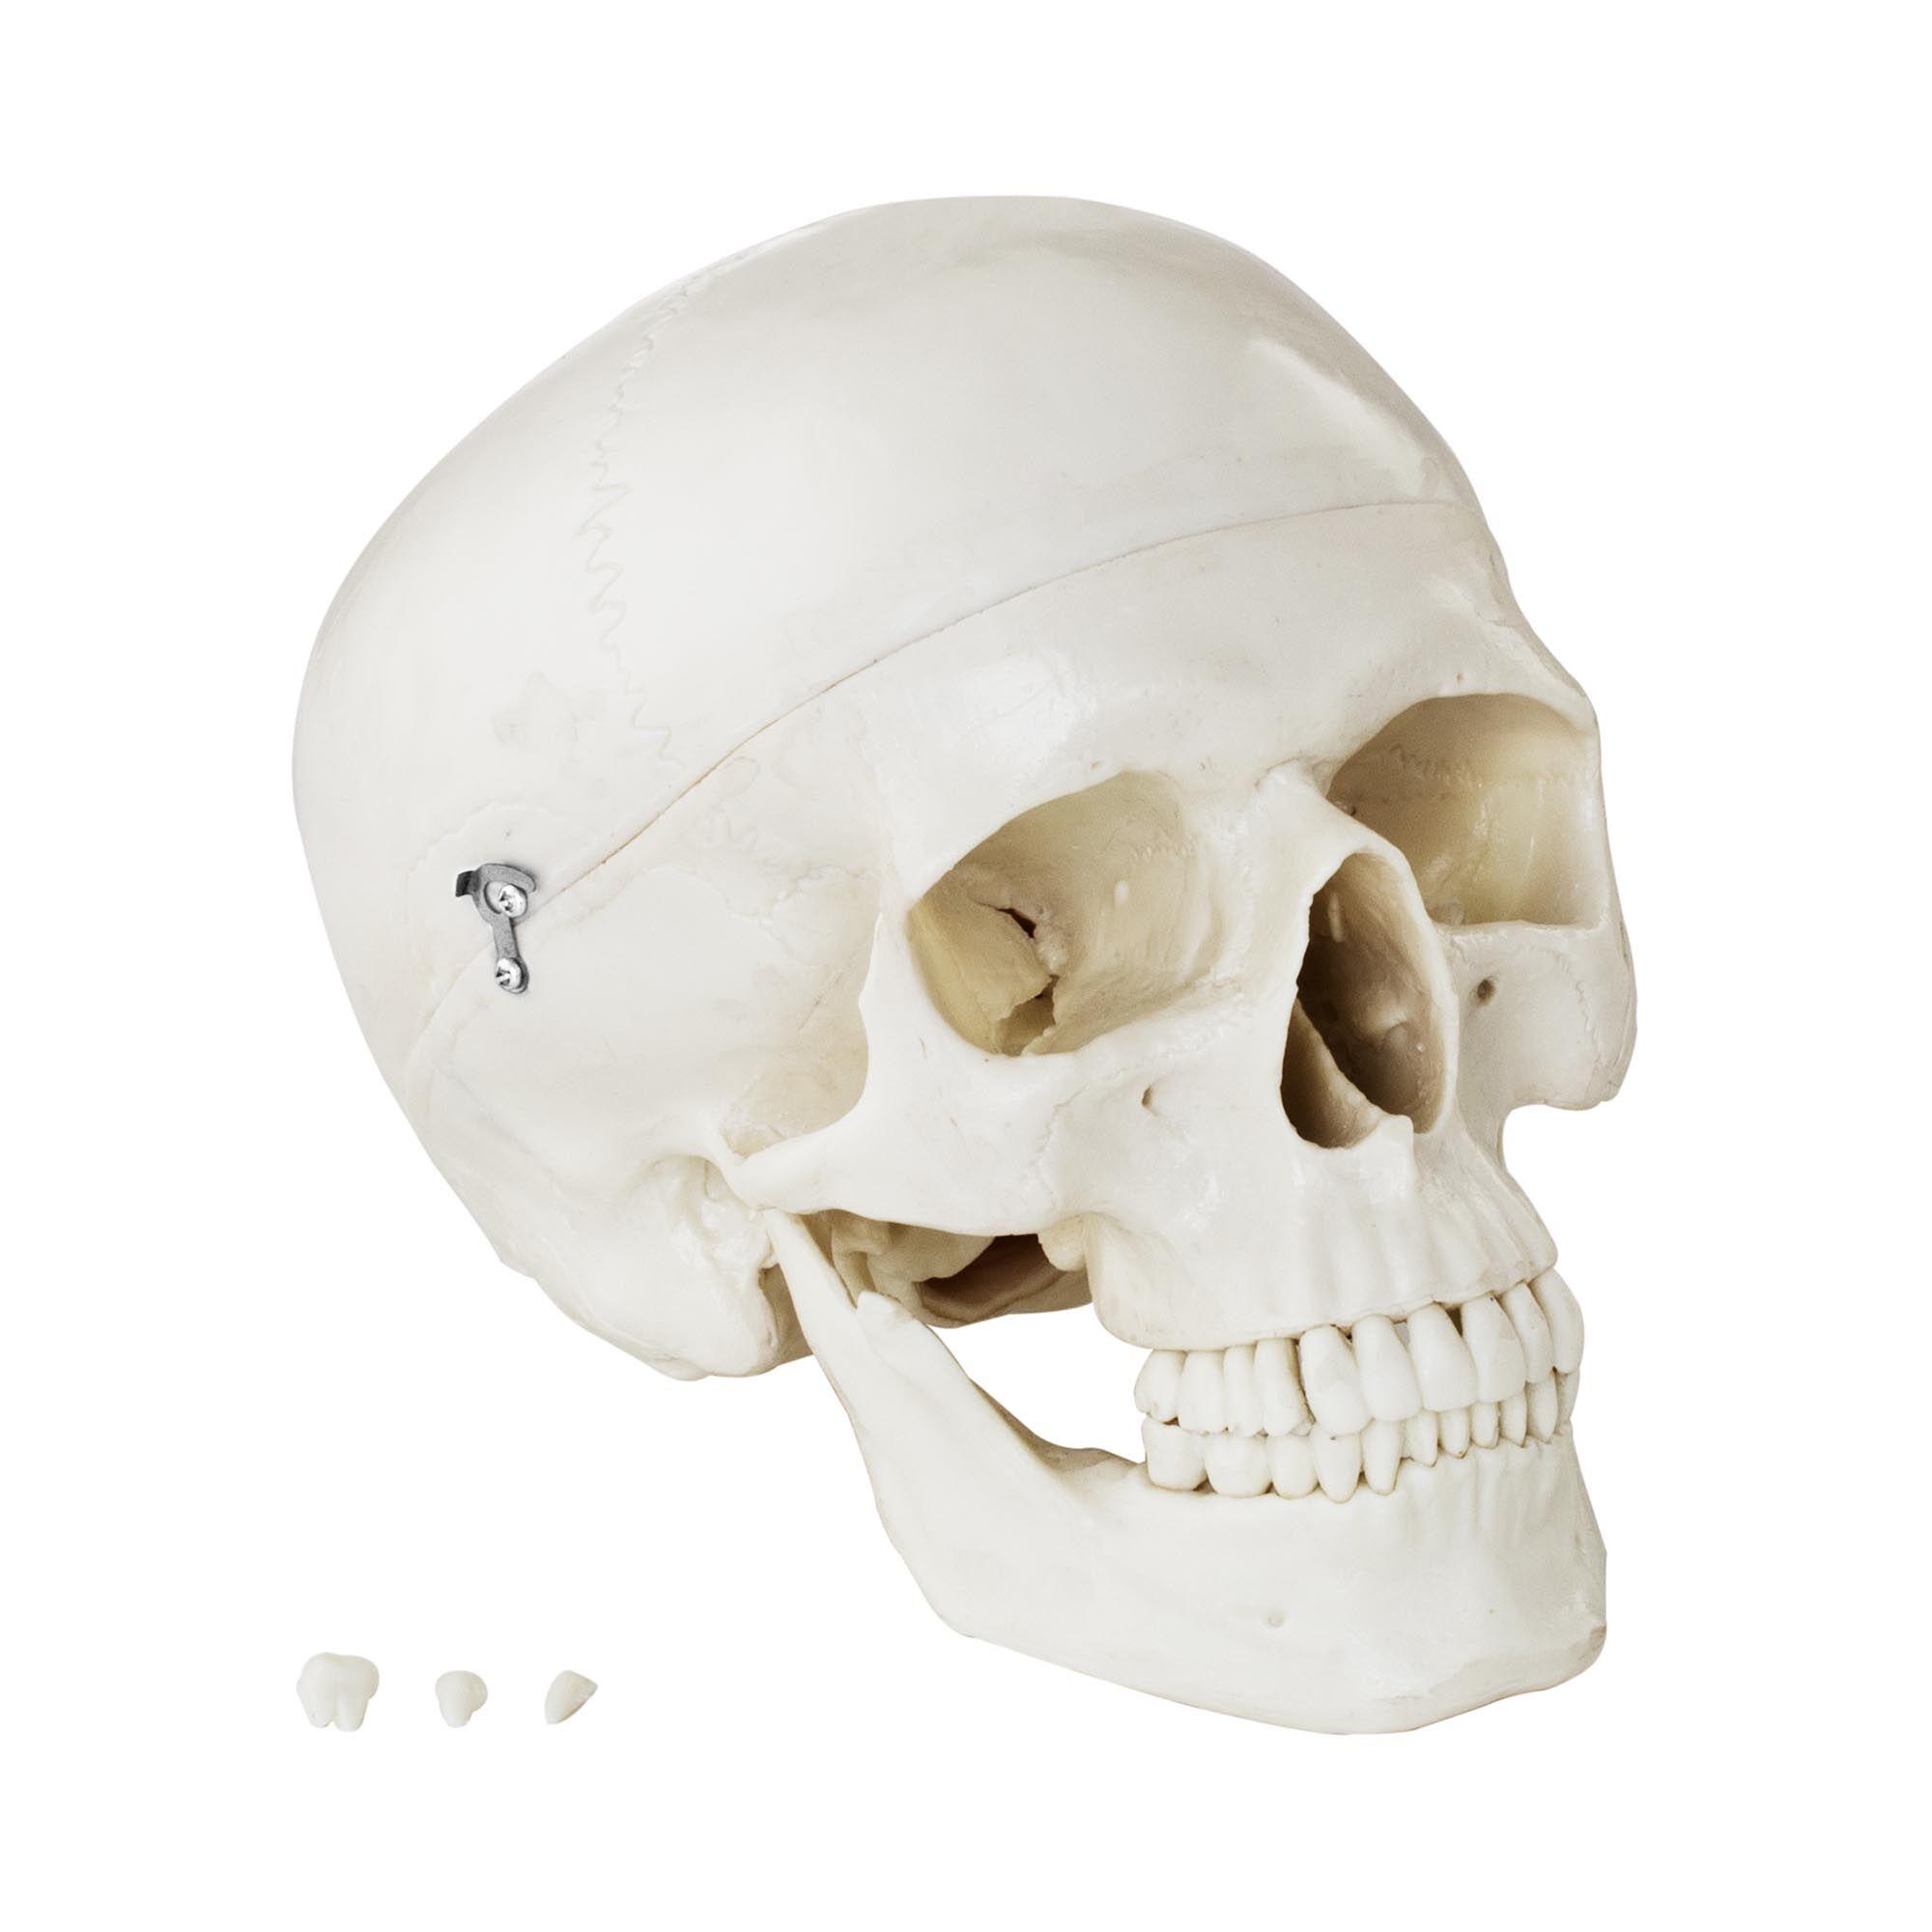 physa Skull Model - white PHY-SK-4